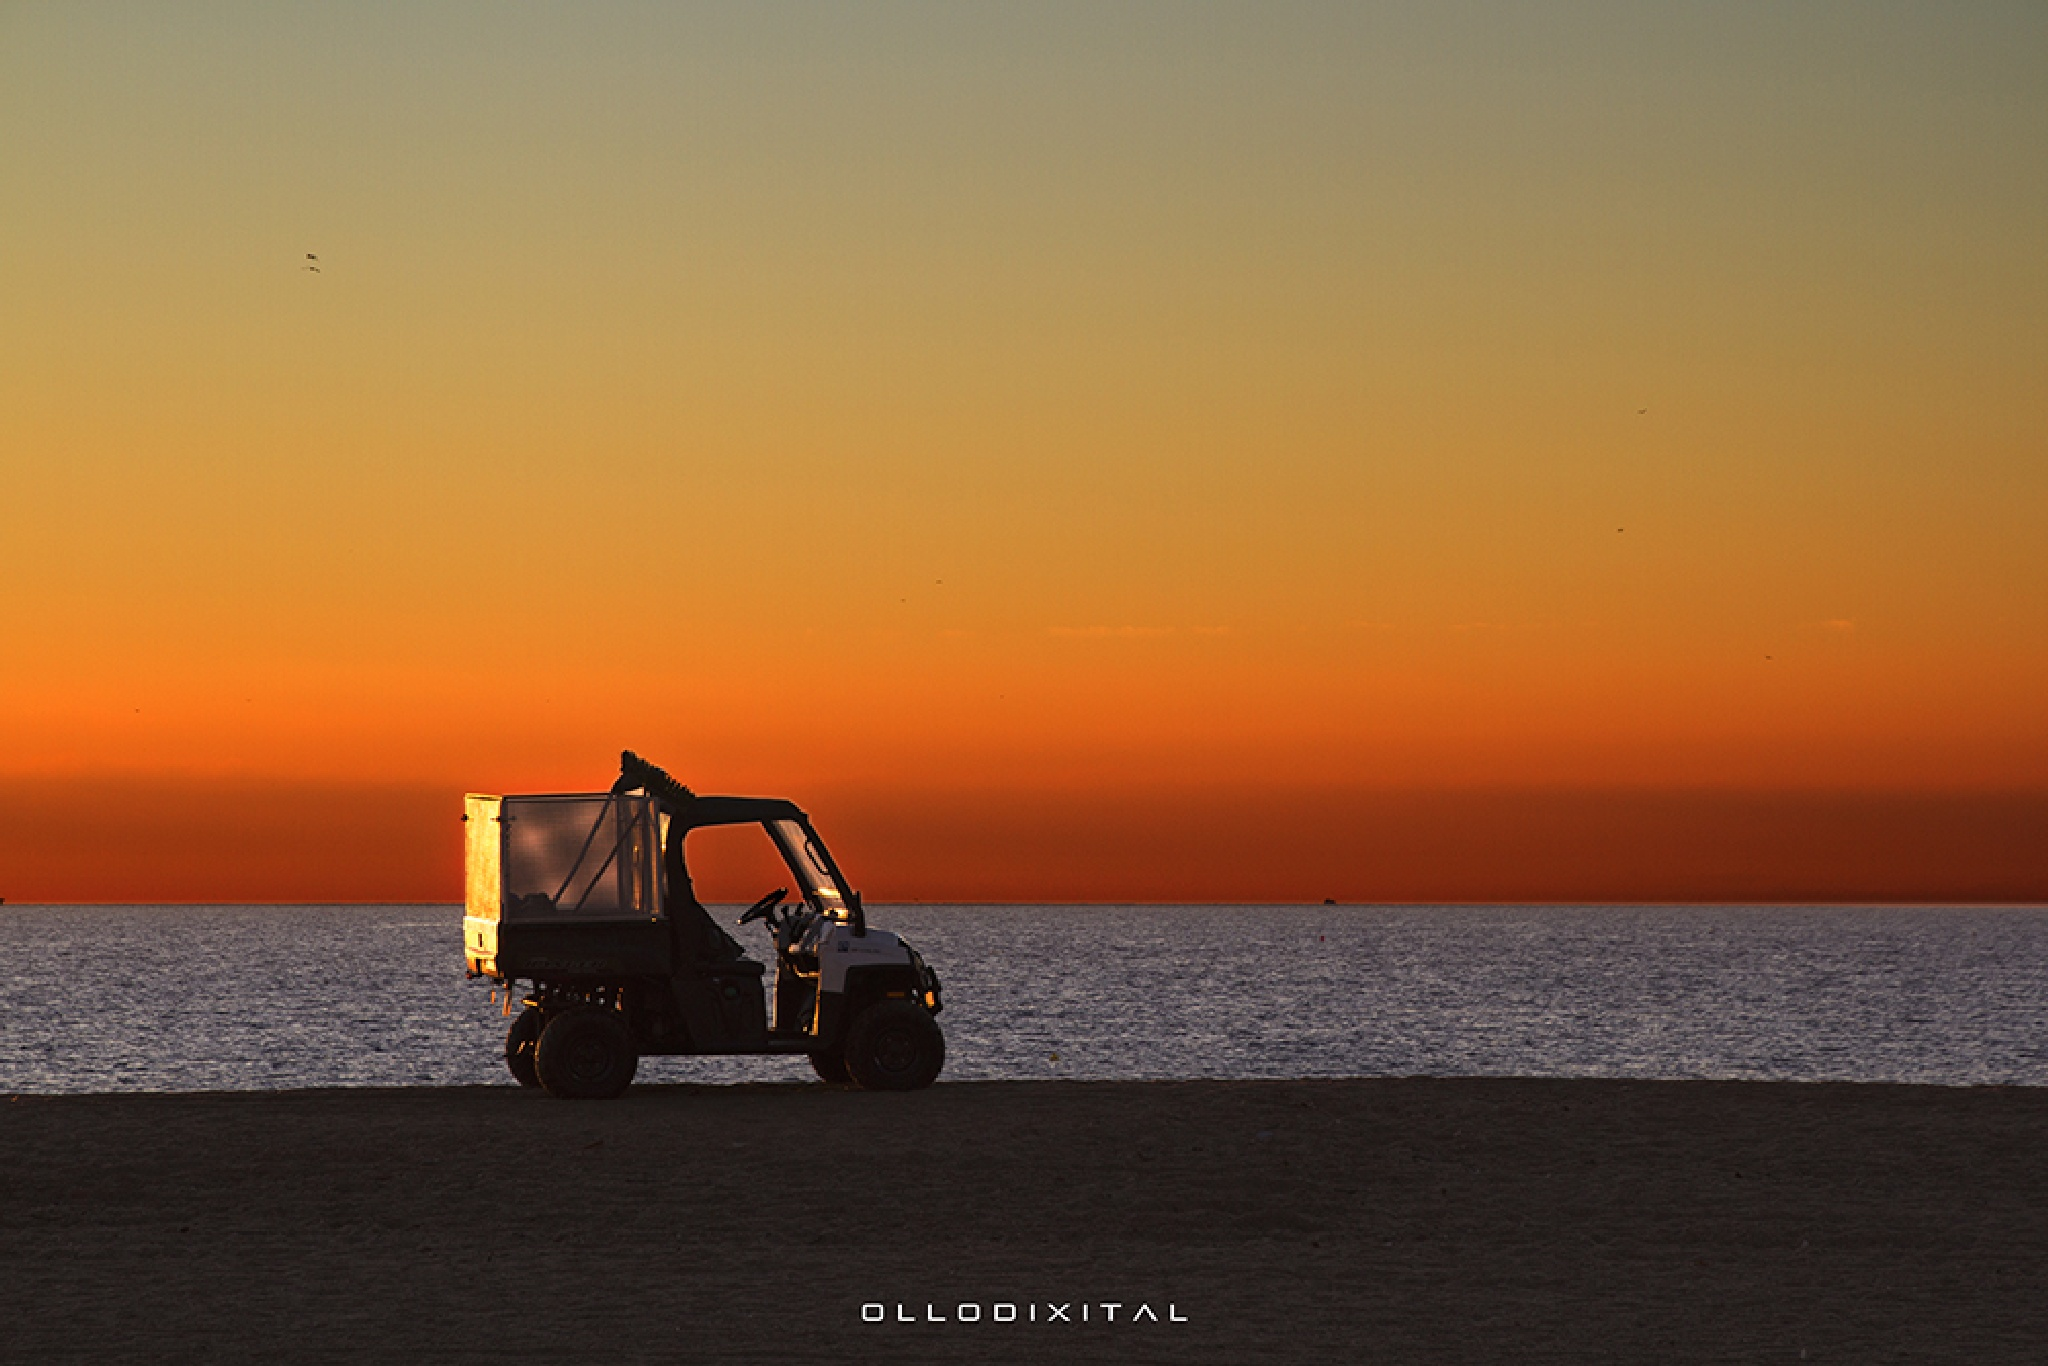 Mediterranean by OlloDixital